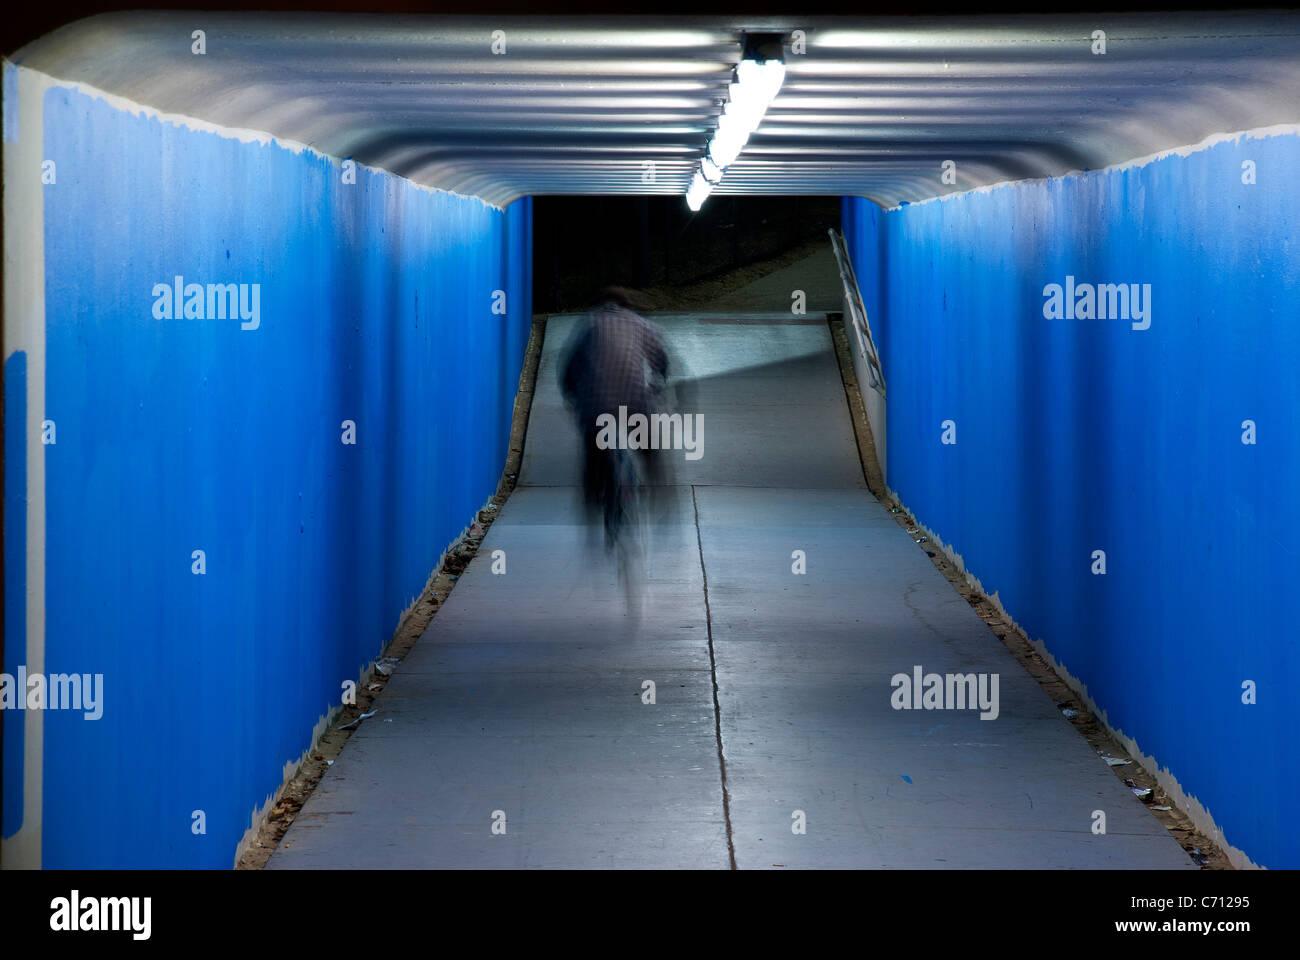 Bike rider in urban tunnel at night - Stock Image